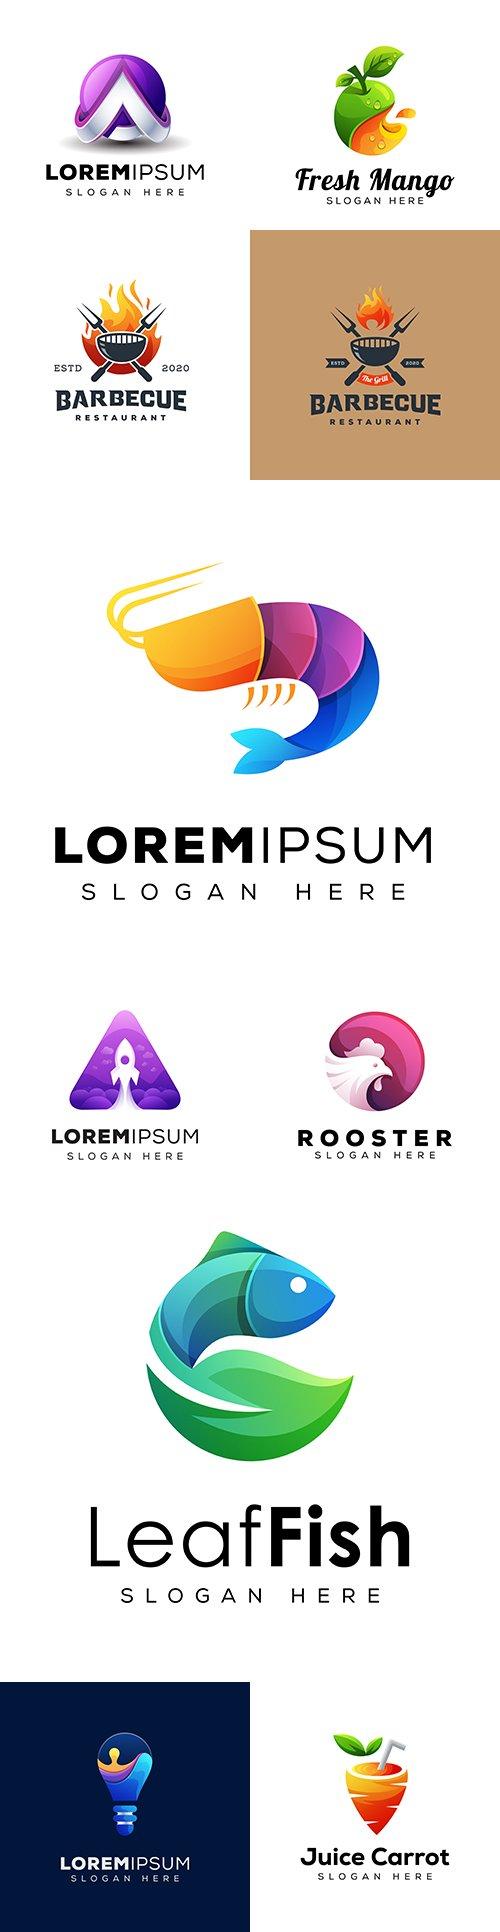 Creative business logos corporate company design 41